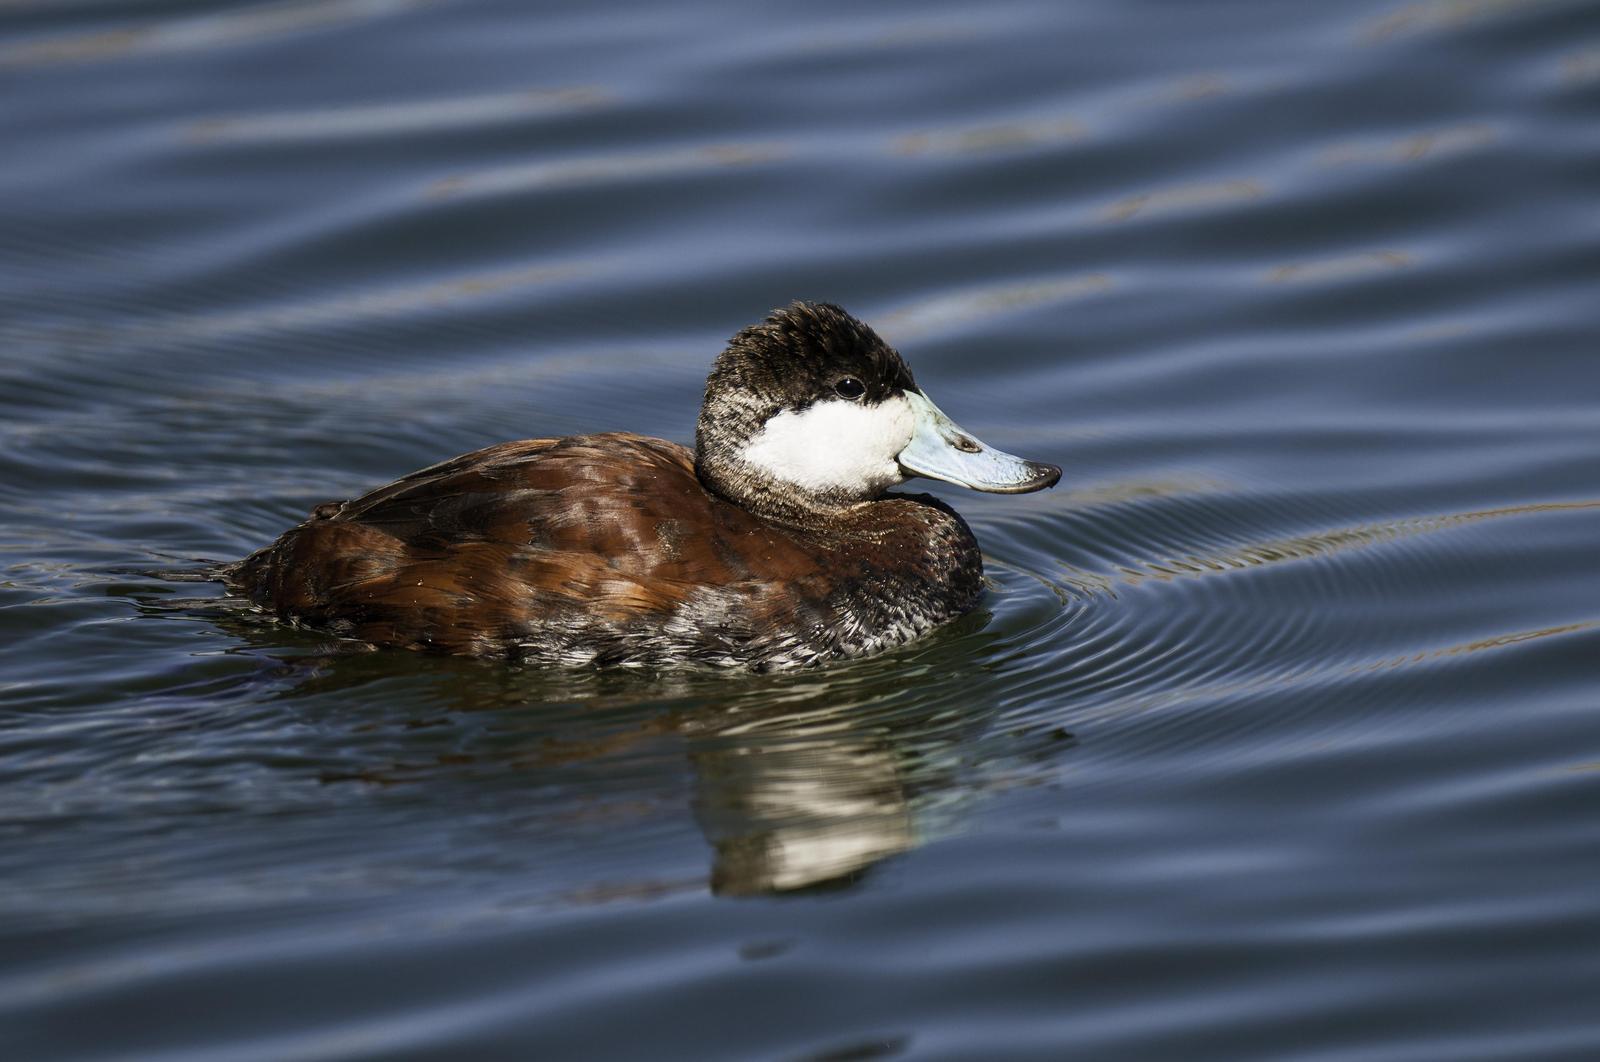 Ruddy Duck Photo by Mason Rose